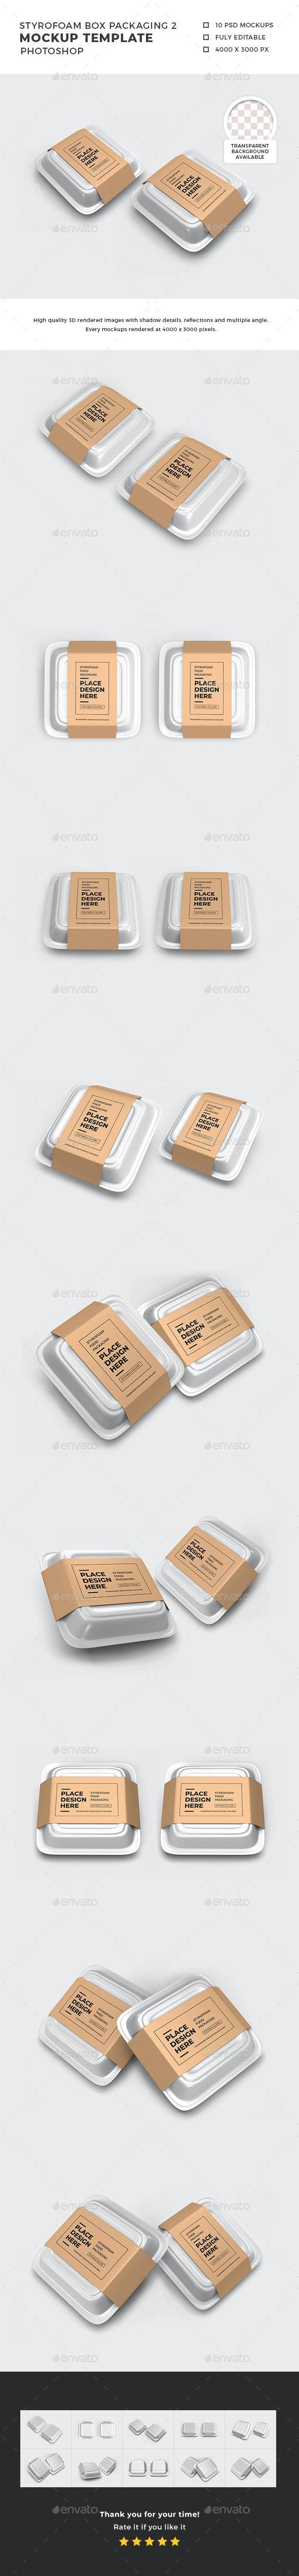 Styrofoam Box Packaging Mockup Template 2 - Food and Drink Packaging